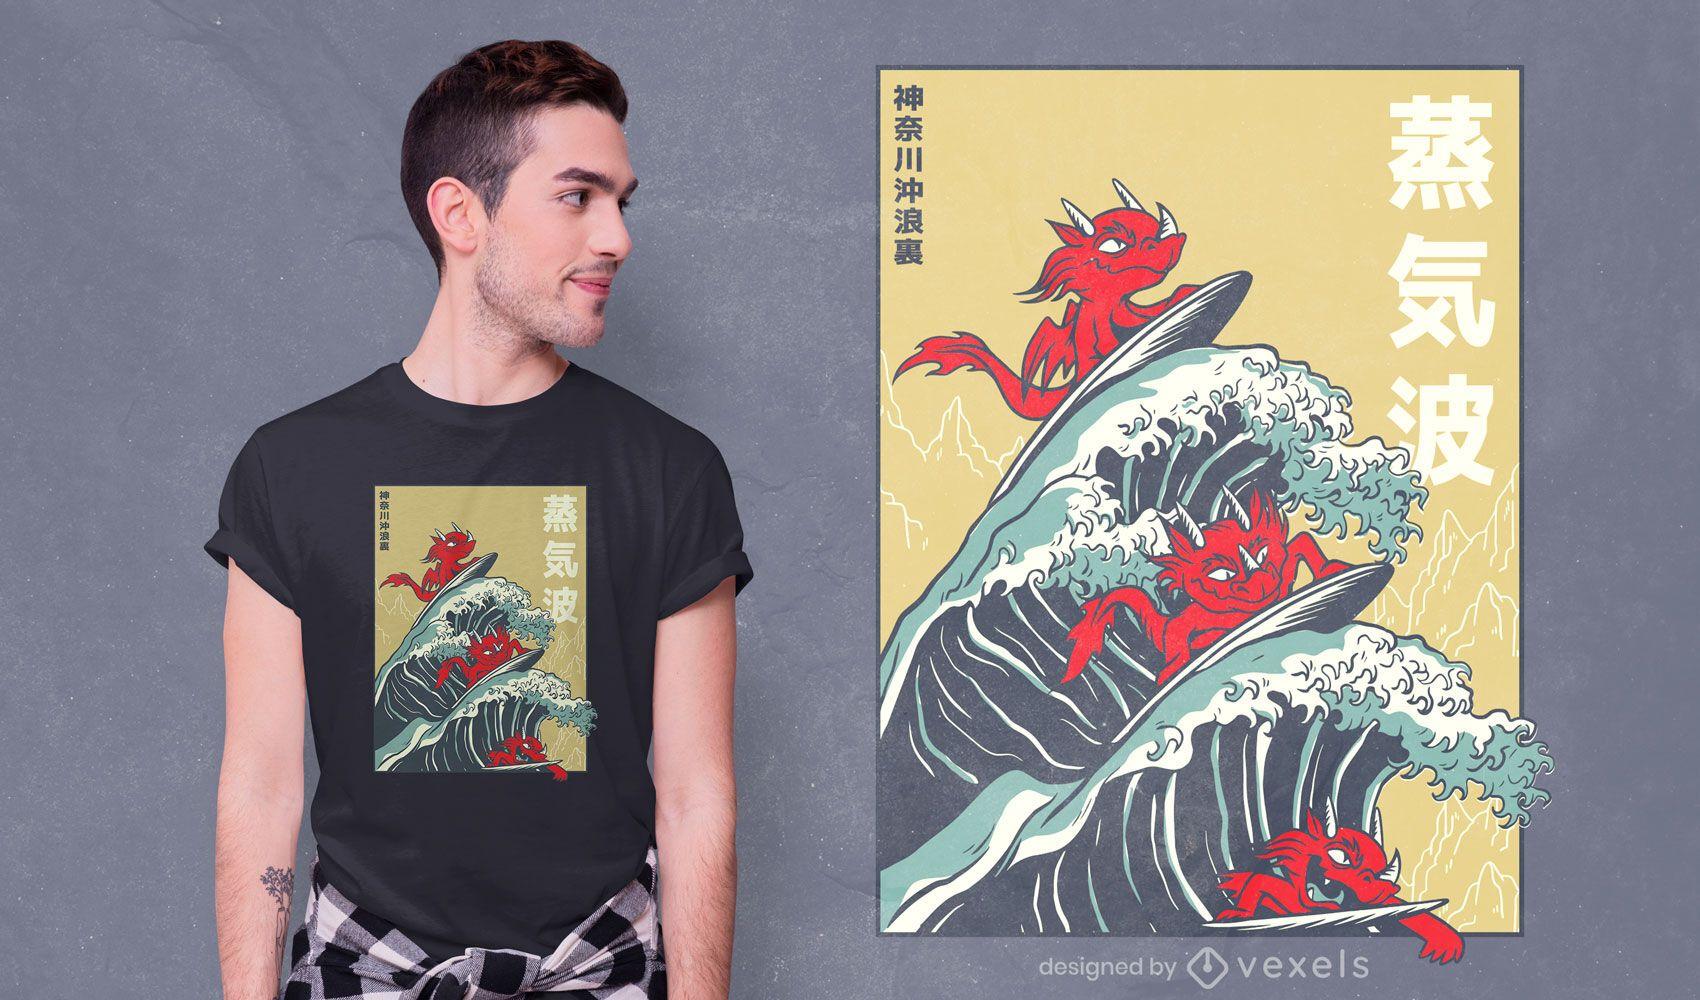 Dragões surfando design de camisetas vaporwave